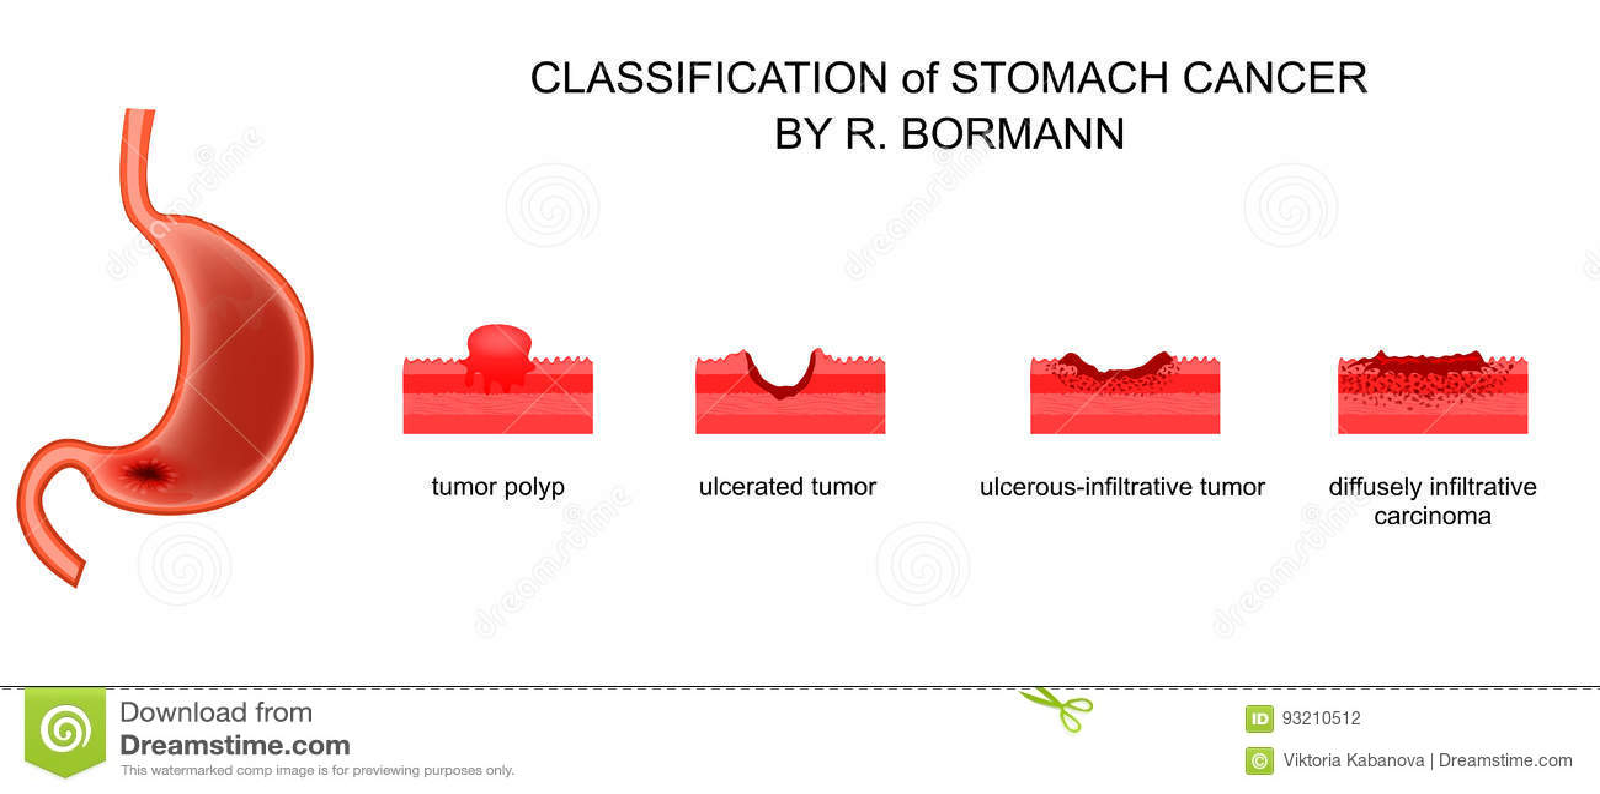 gastric cancer borrmann classification human papillomavirus recommendations